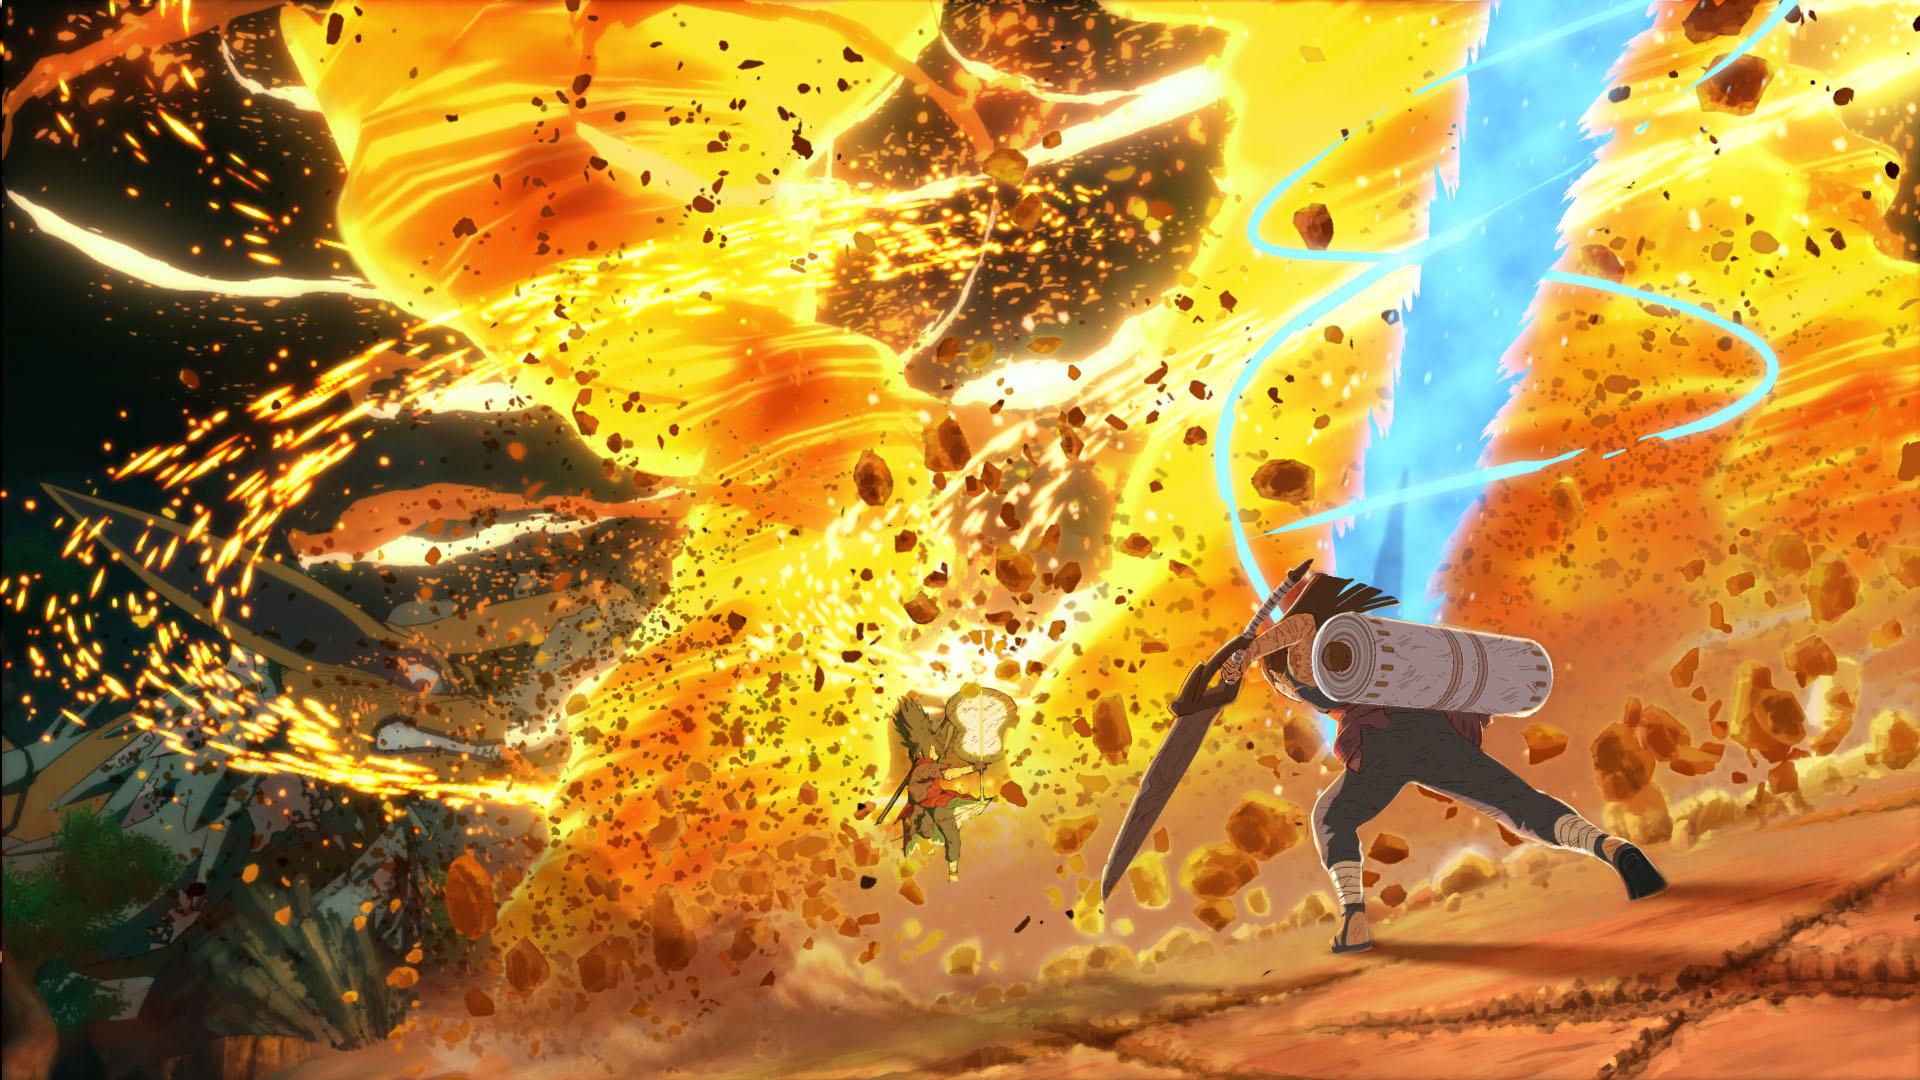 Naruto Shippuden: Ultimate Ninja Storm 4 Review (PS4) | Push